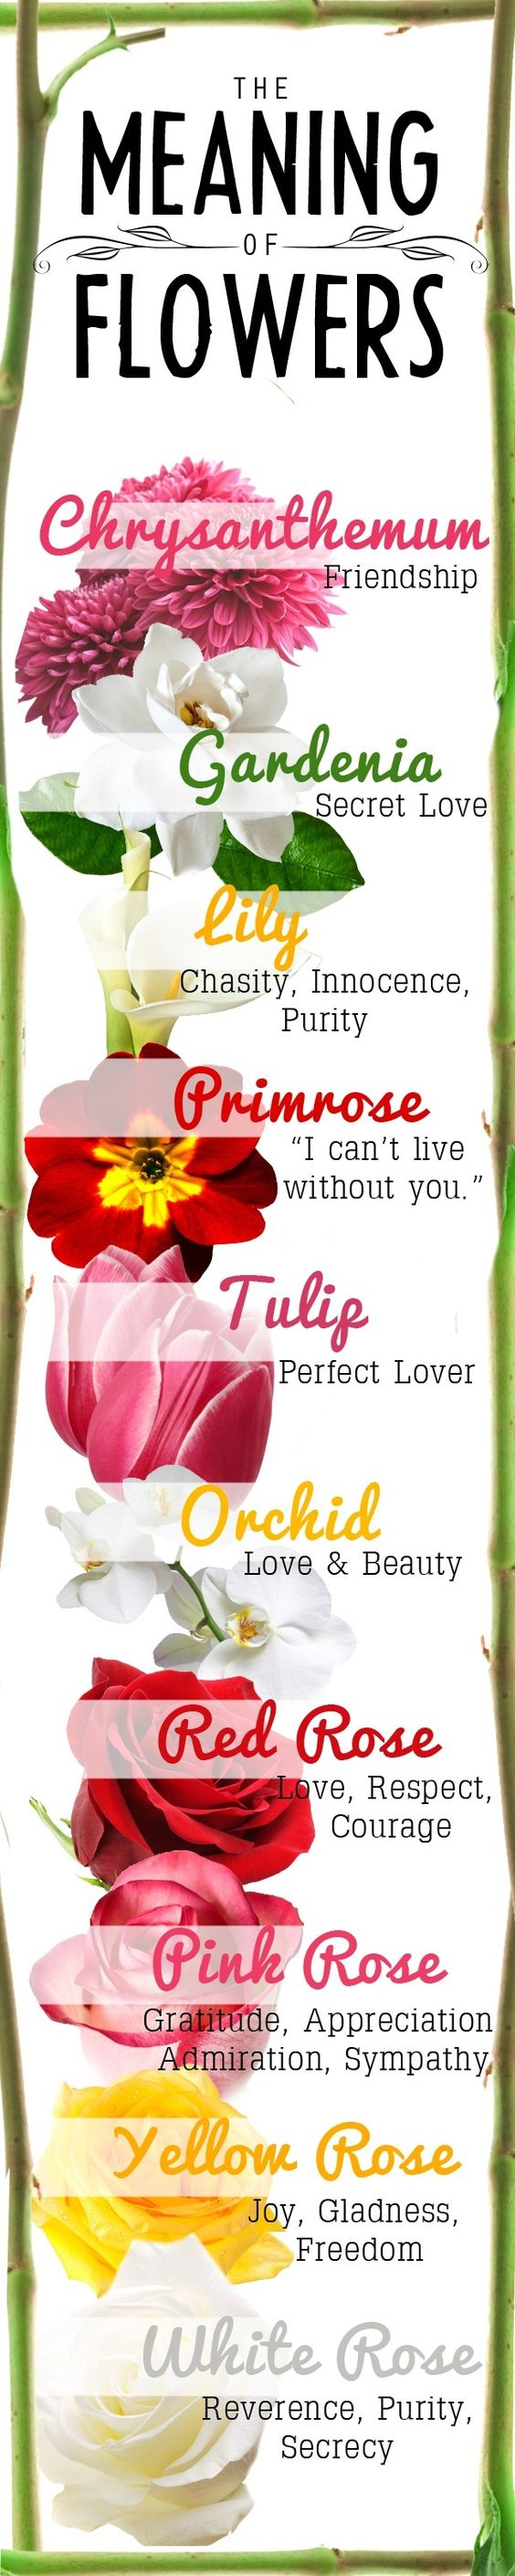 flores e o seu significado